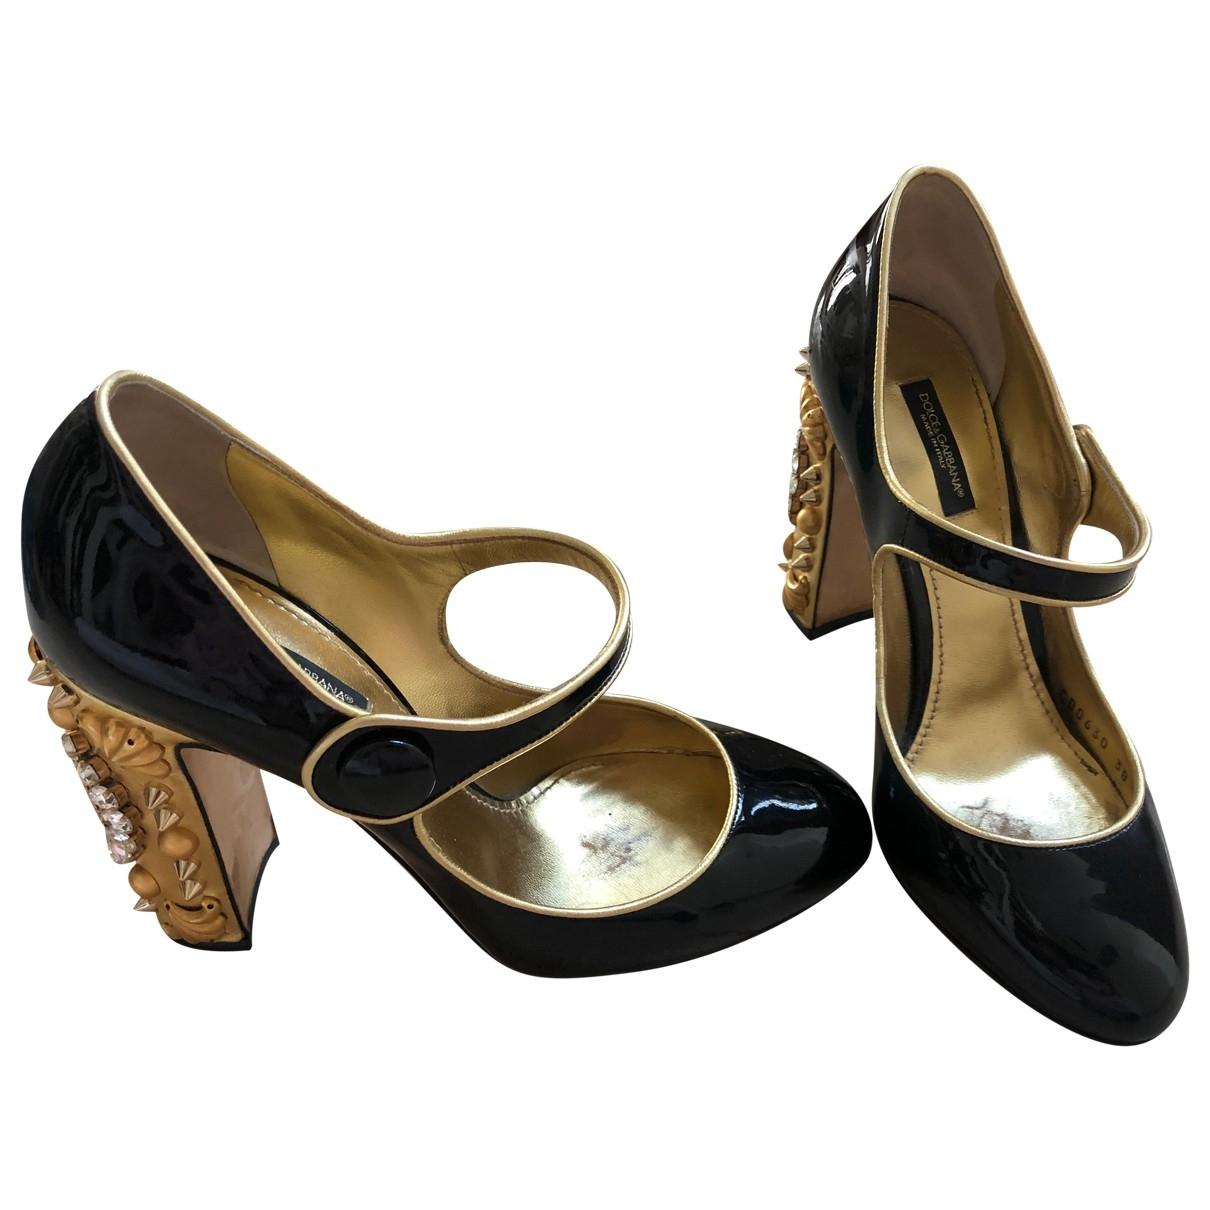 Dolce & Gabbana \N Black Patent leather Heels for Women 38 EU